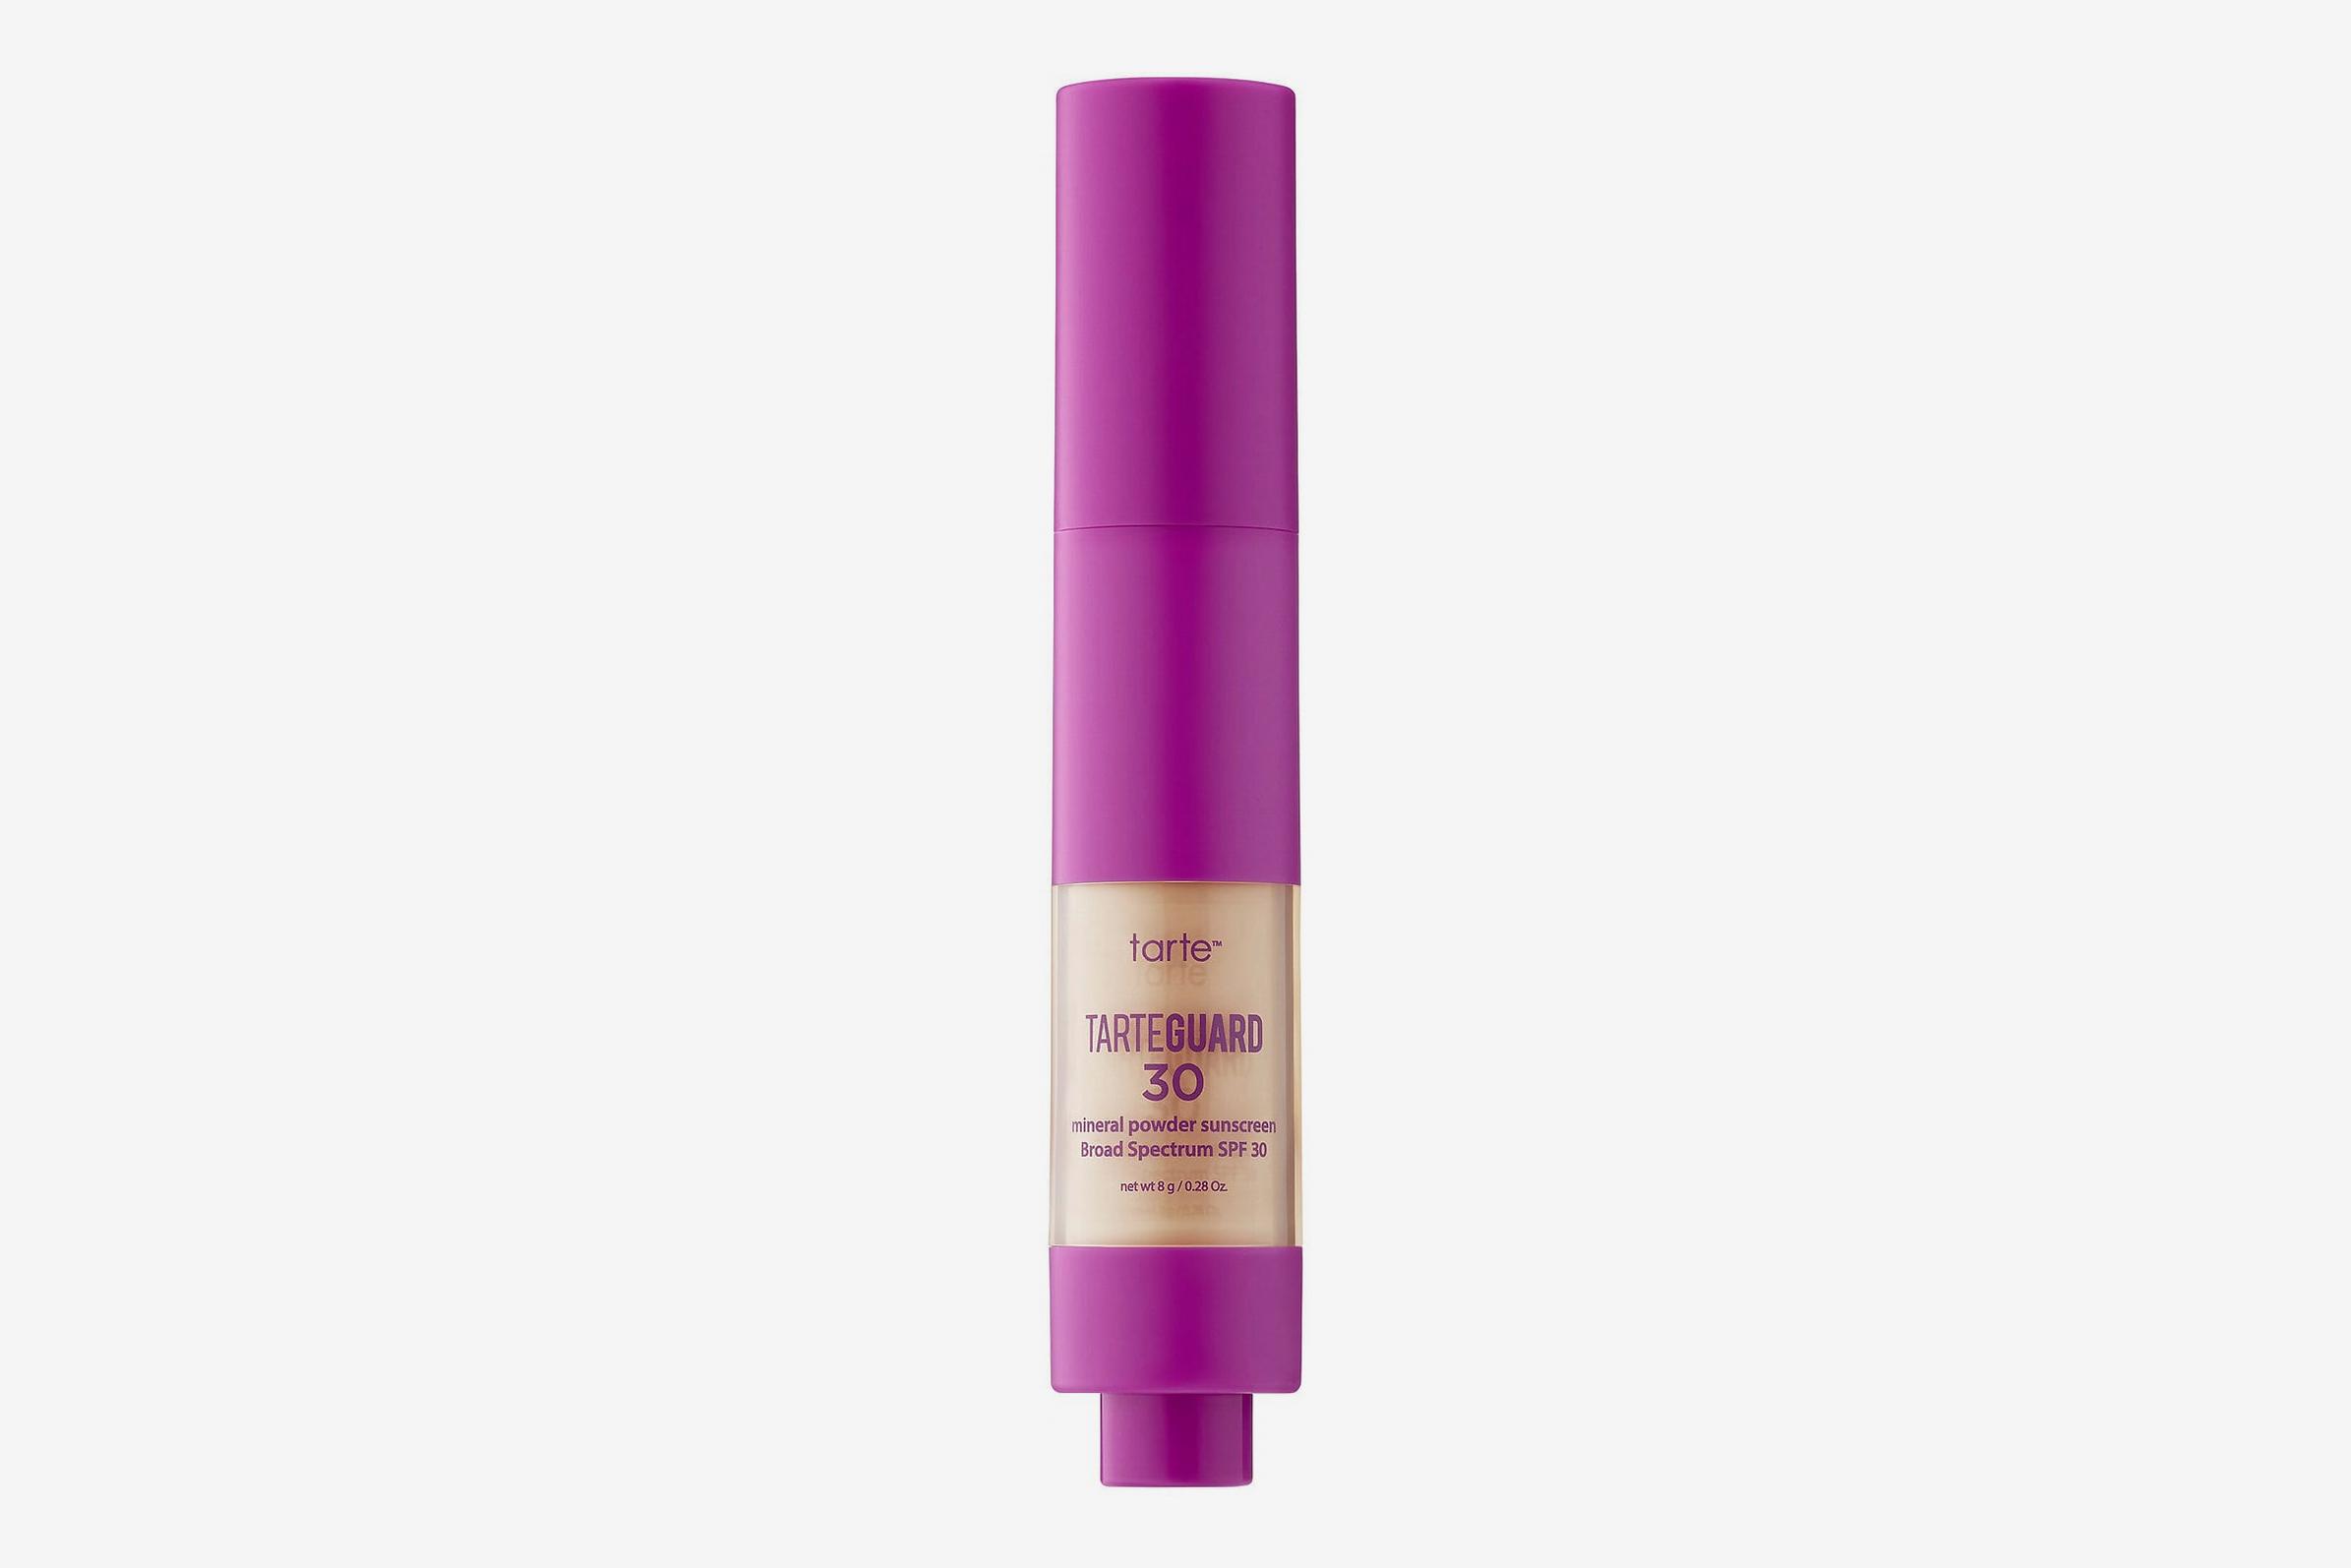 Tare Tarteguard Mineral Powder Sunscreen Broad Spectrum SPF 30